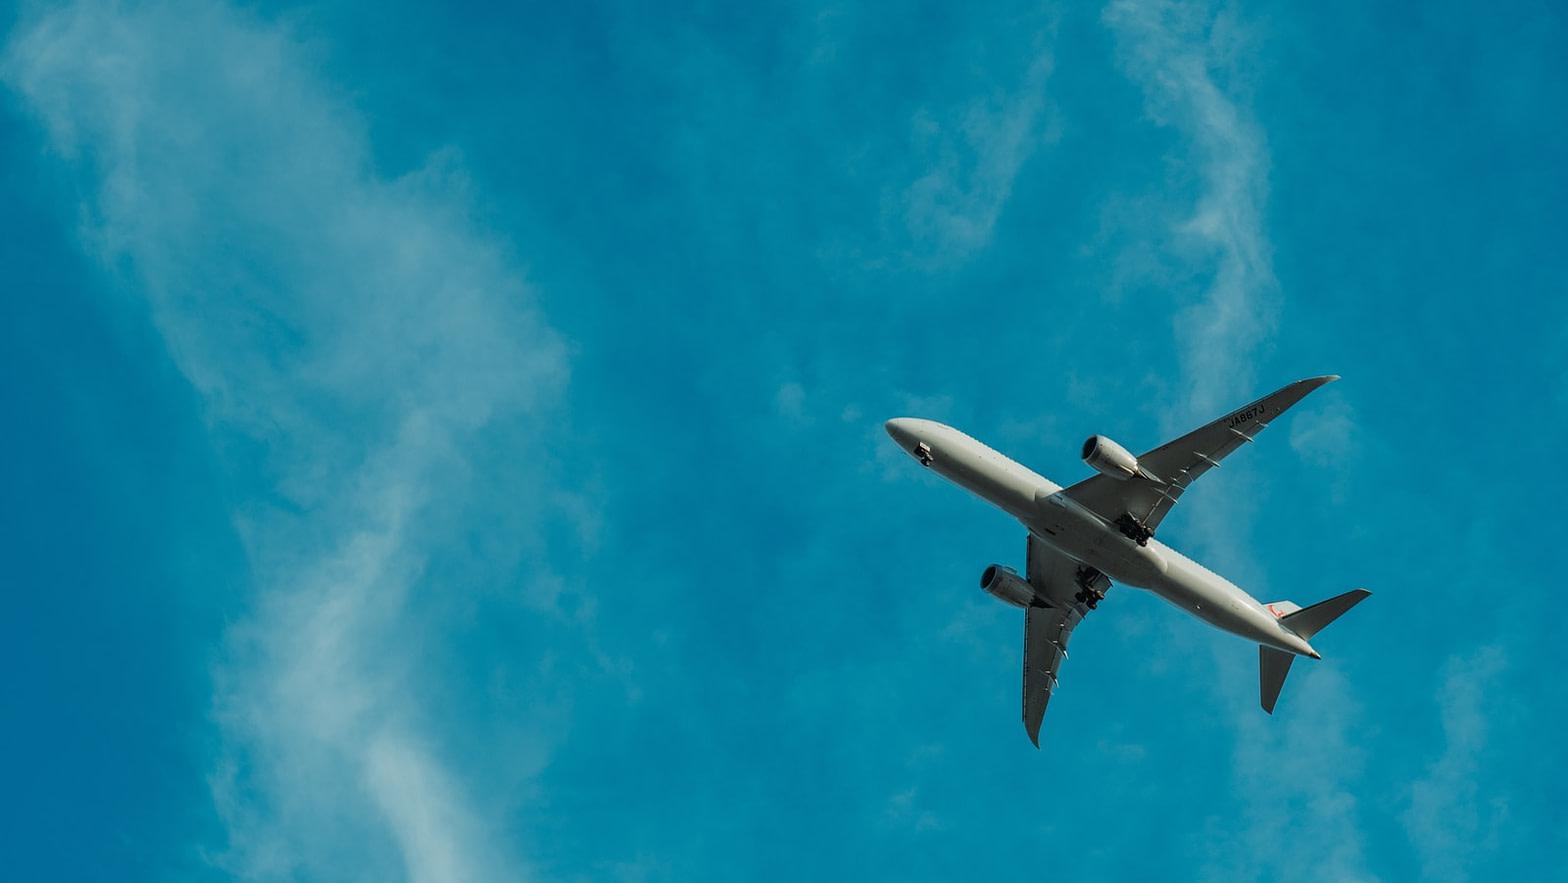 gray airplane flying during daytime